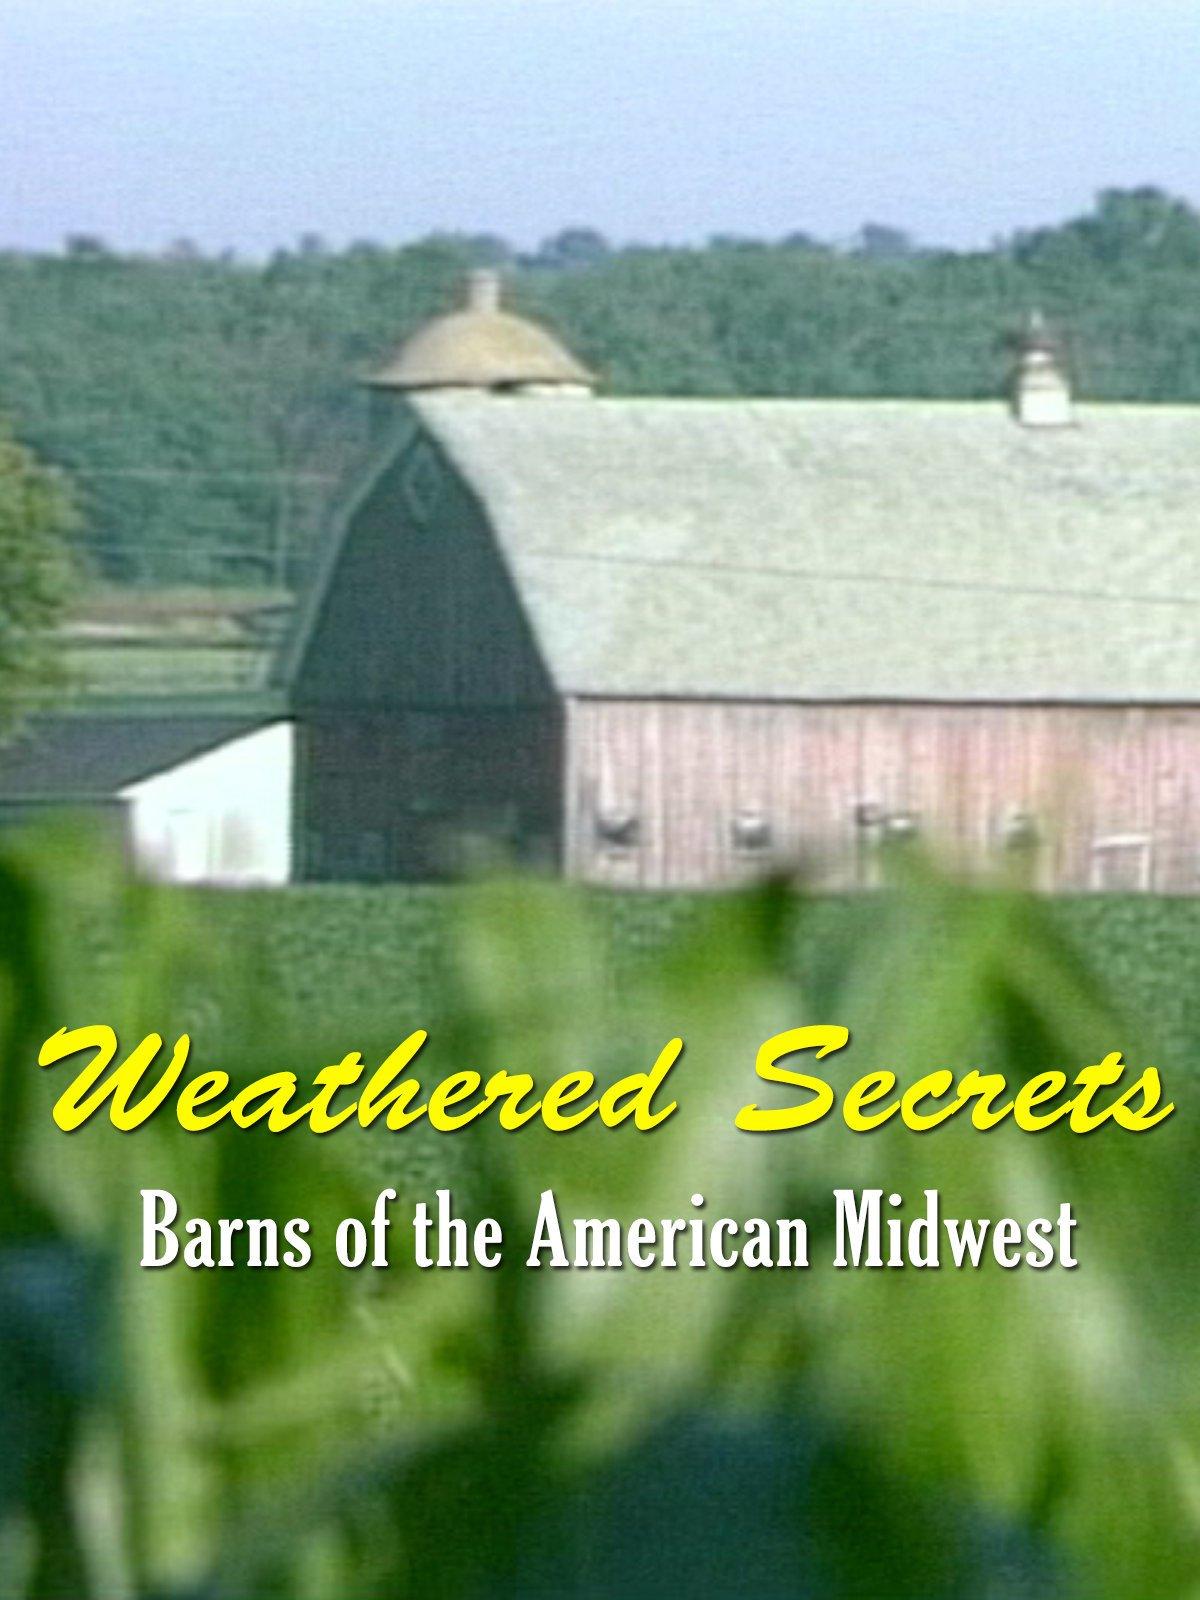 Weathered Secrets